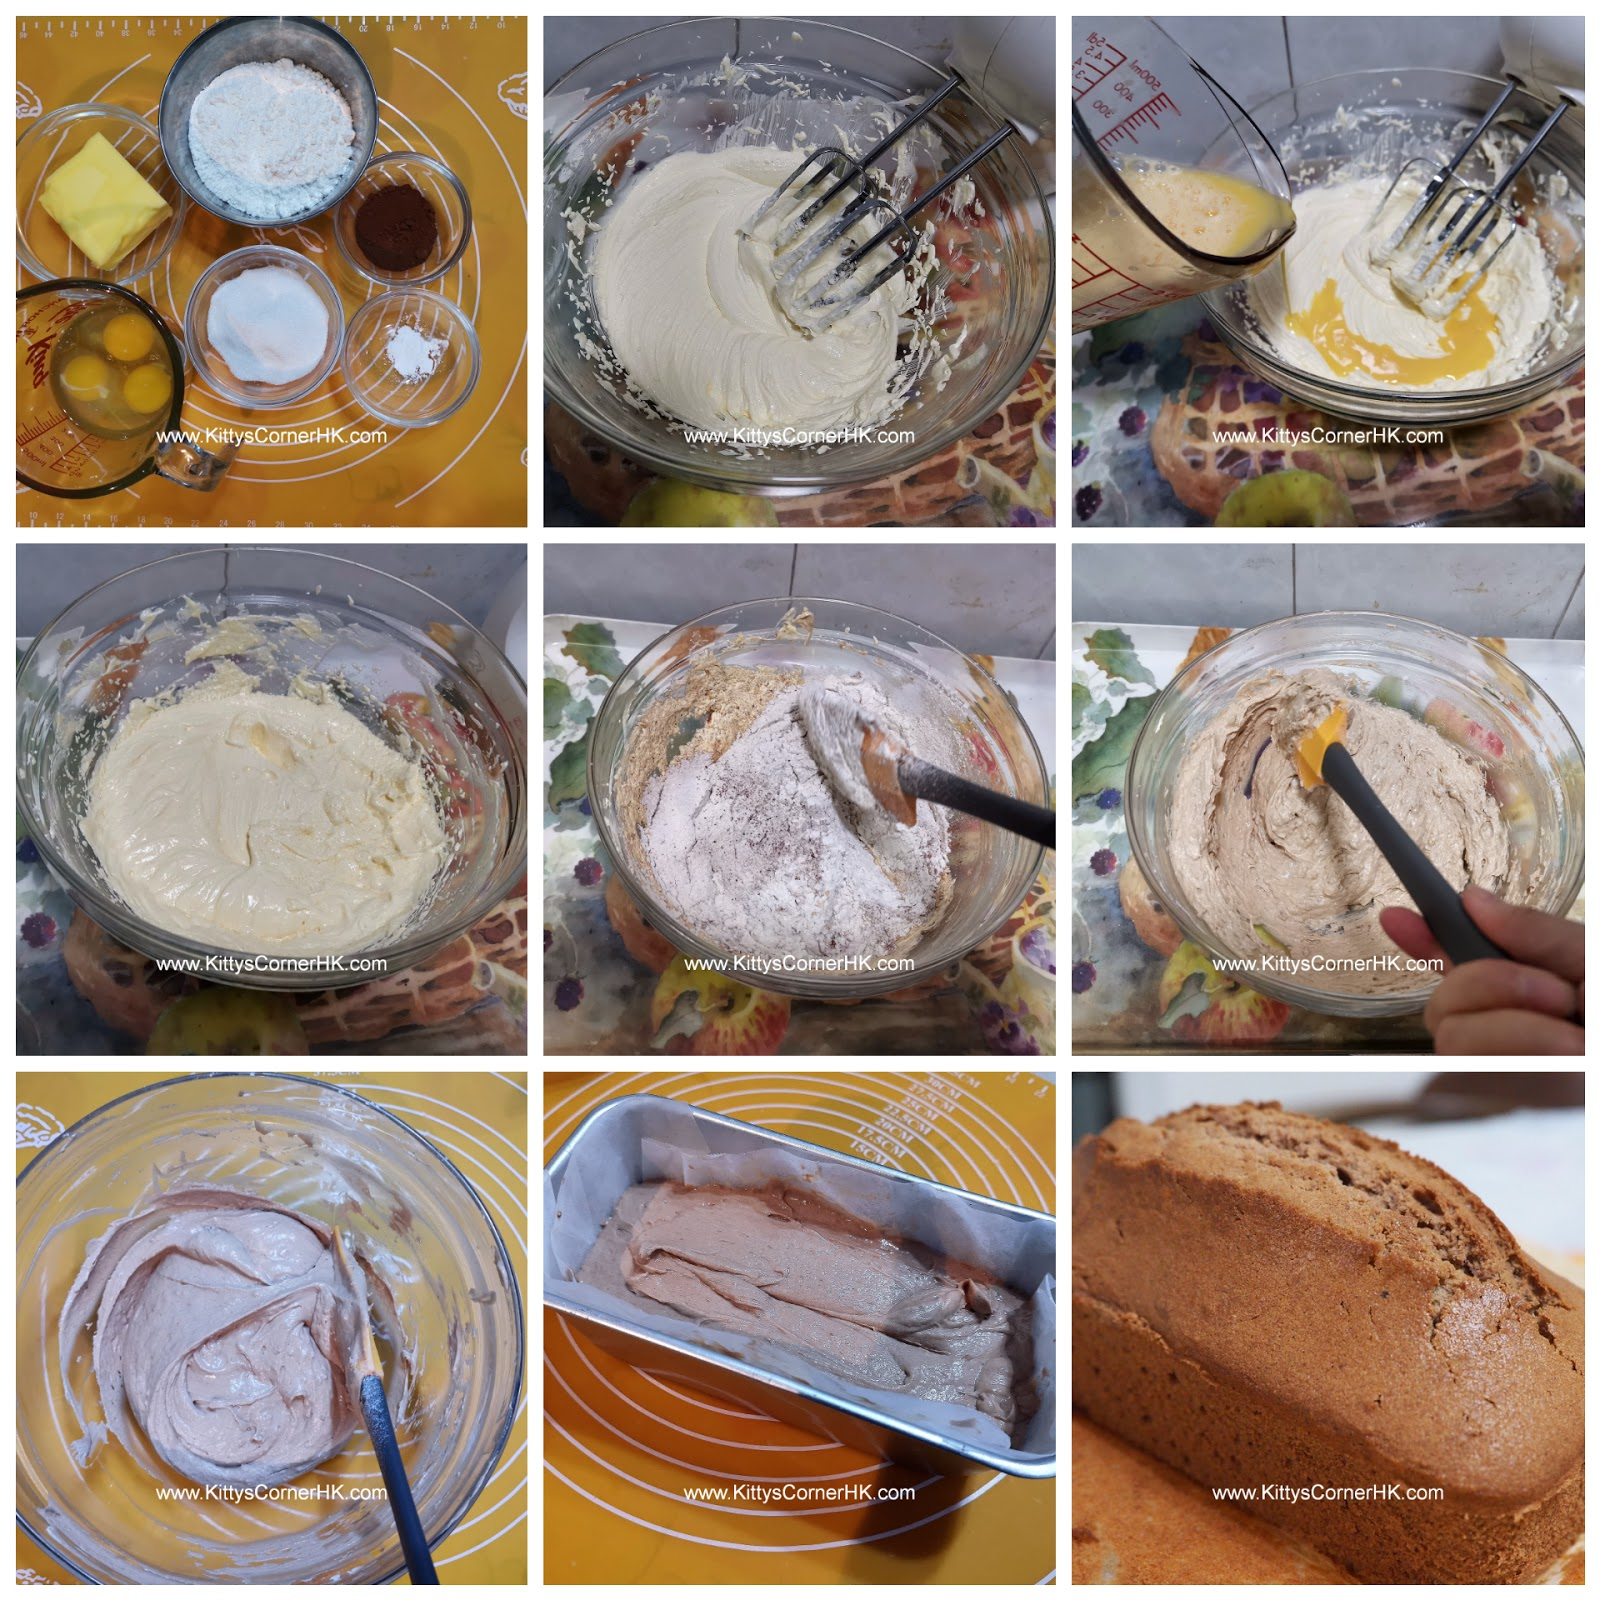 Chocolate Pound Cake DIY recipe 巧克力蛋糕 自家烘焙食譜